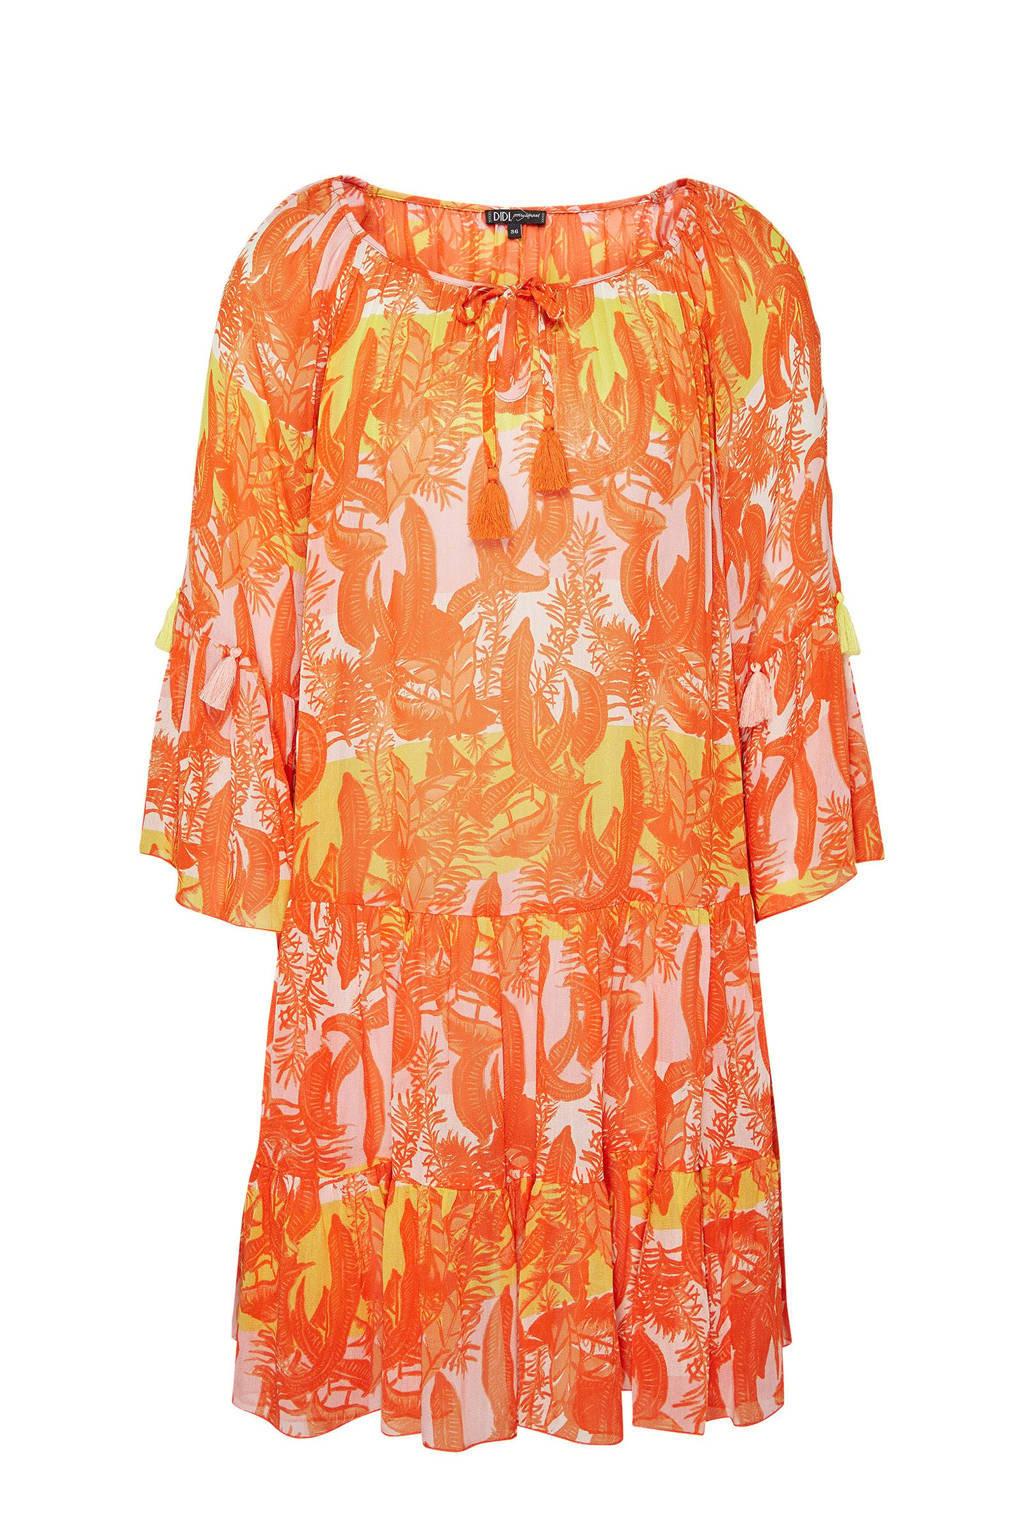 Didi tuniekjurk met all over print oranje, Oranje